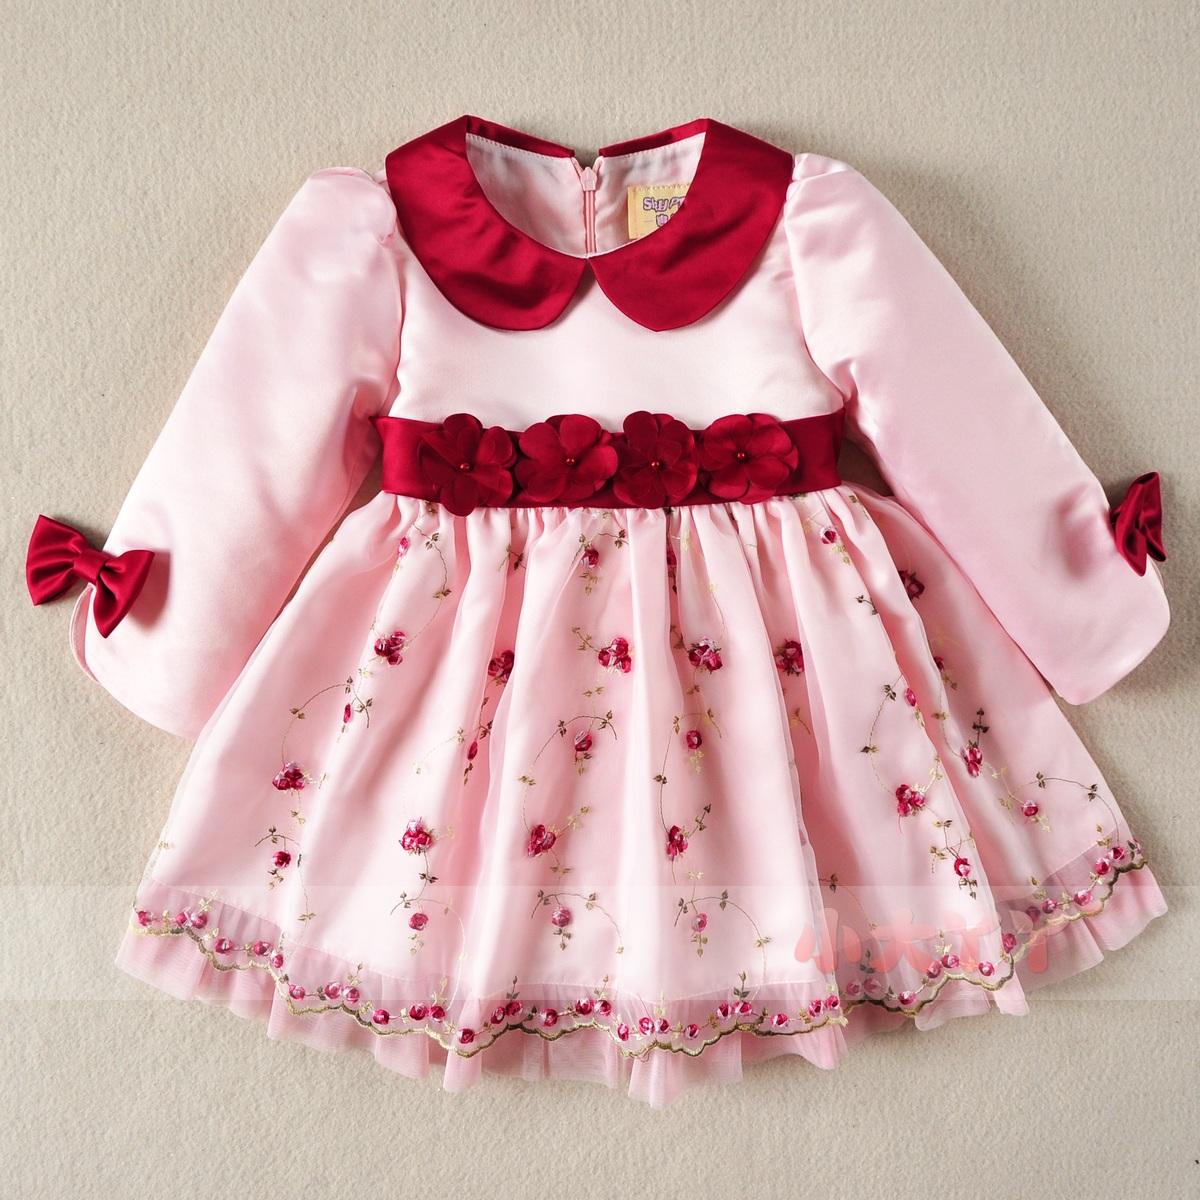 Mikarden 2013 Hitz sequined daisy princess dress children dress flower girl dress girls vest skirt veil